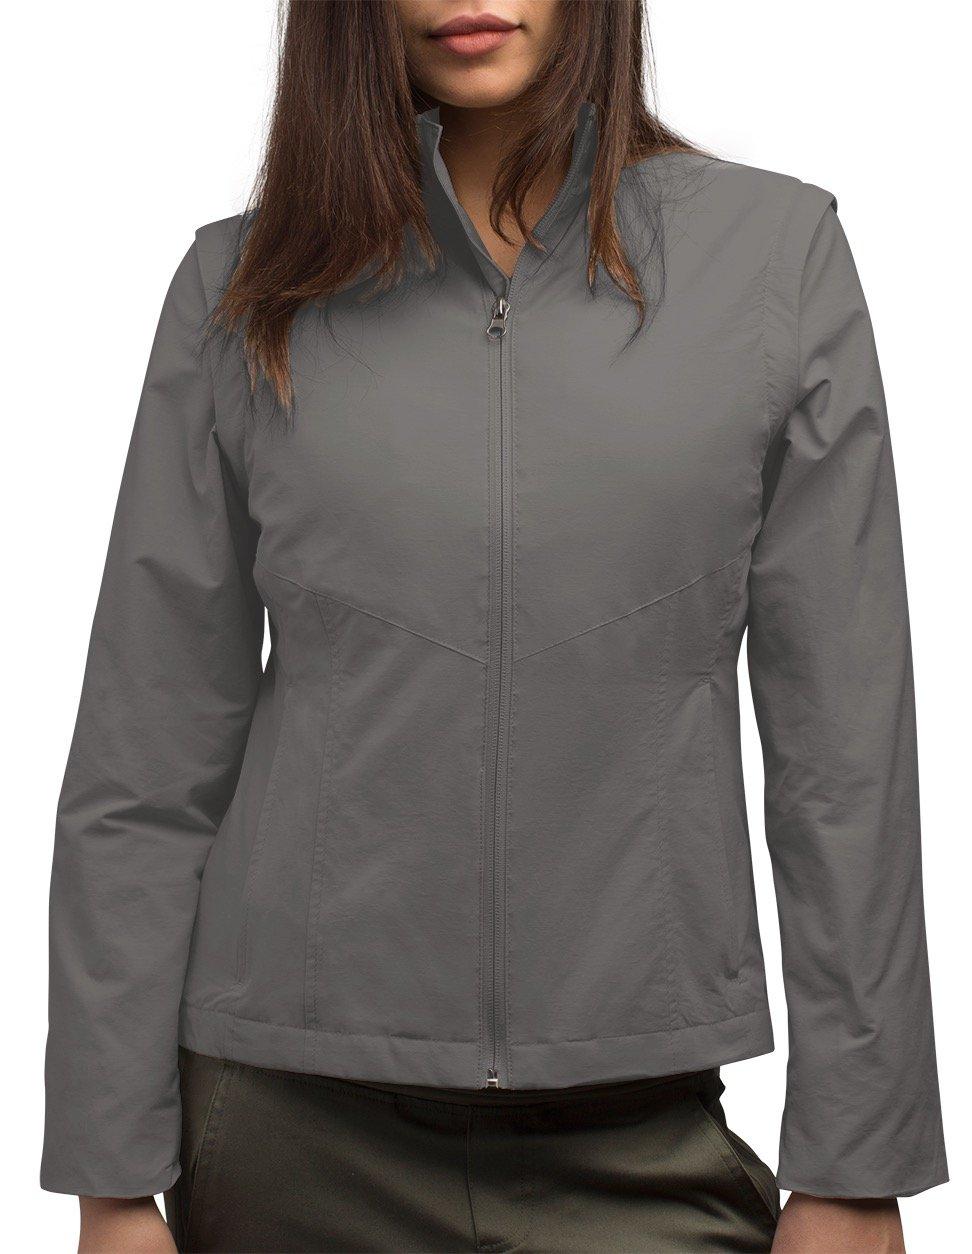 Women's SCOTTeVEST Jacket - 23 Pockets - Travel Clothing FOG M